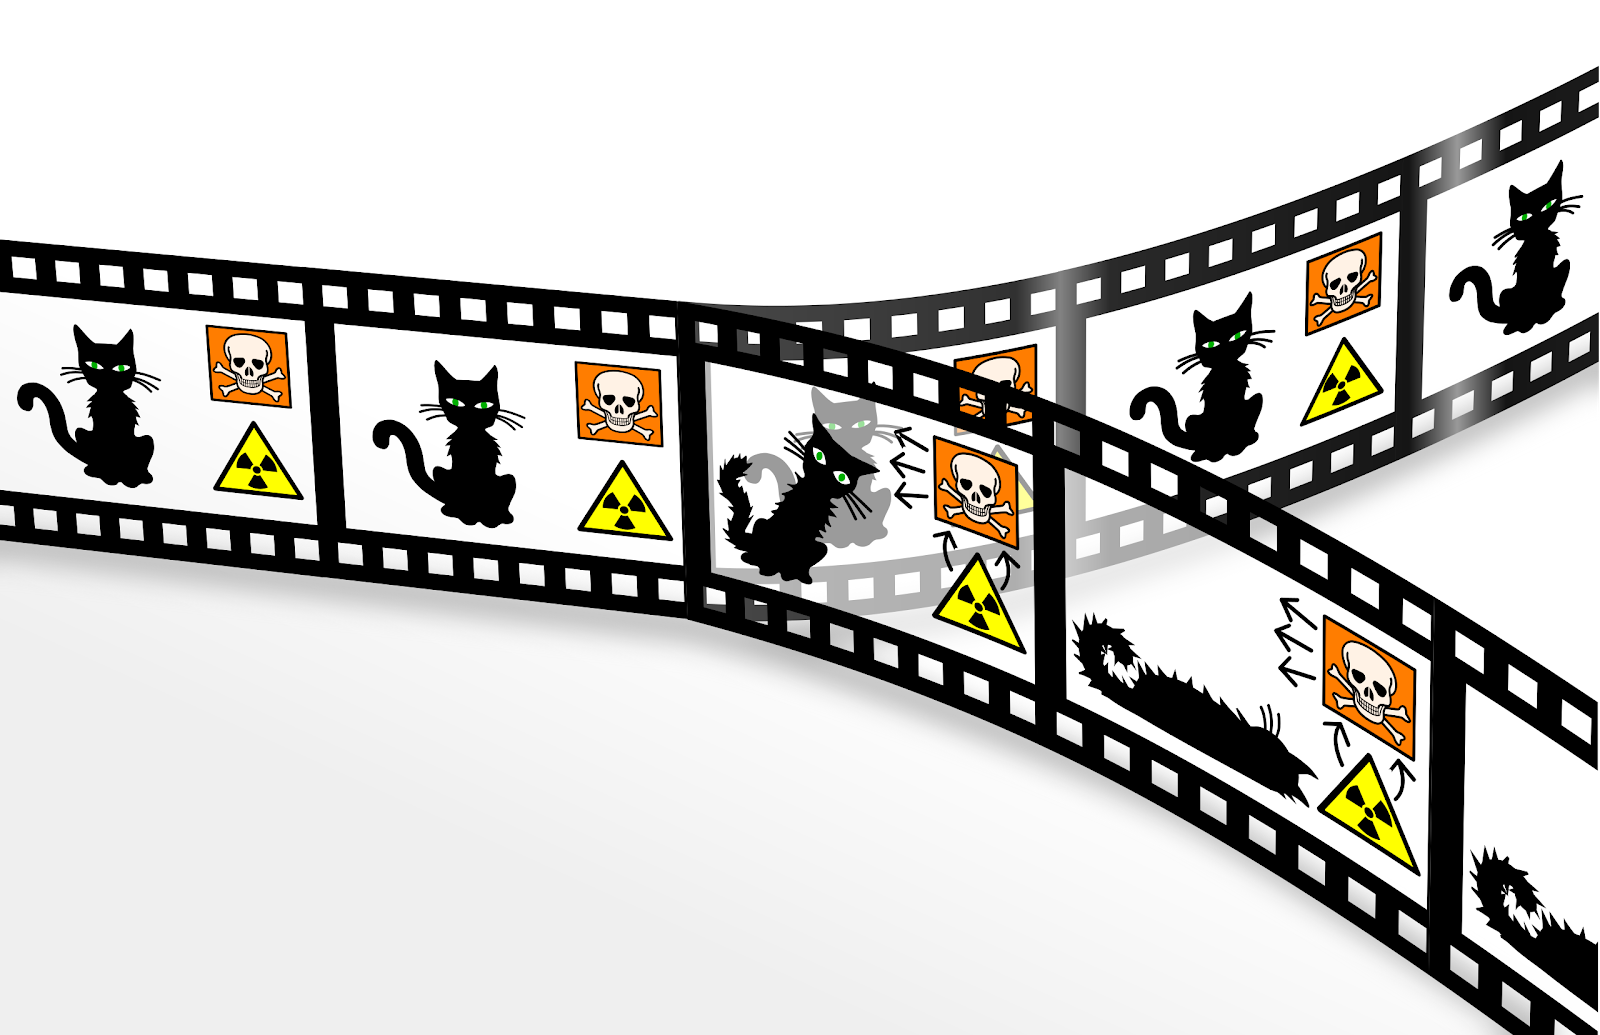 Schrödinger's experiment: entangled cat